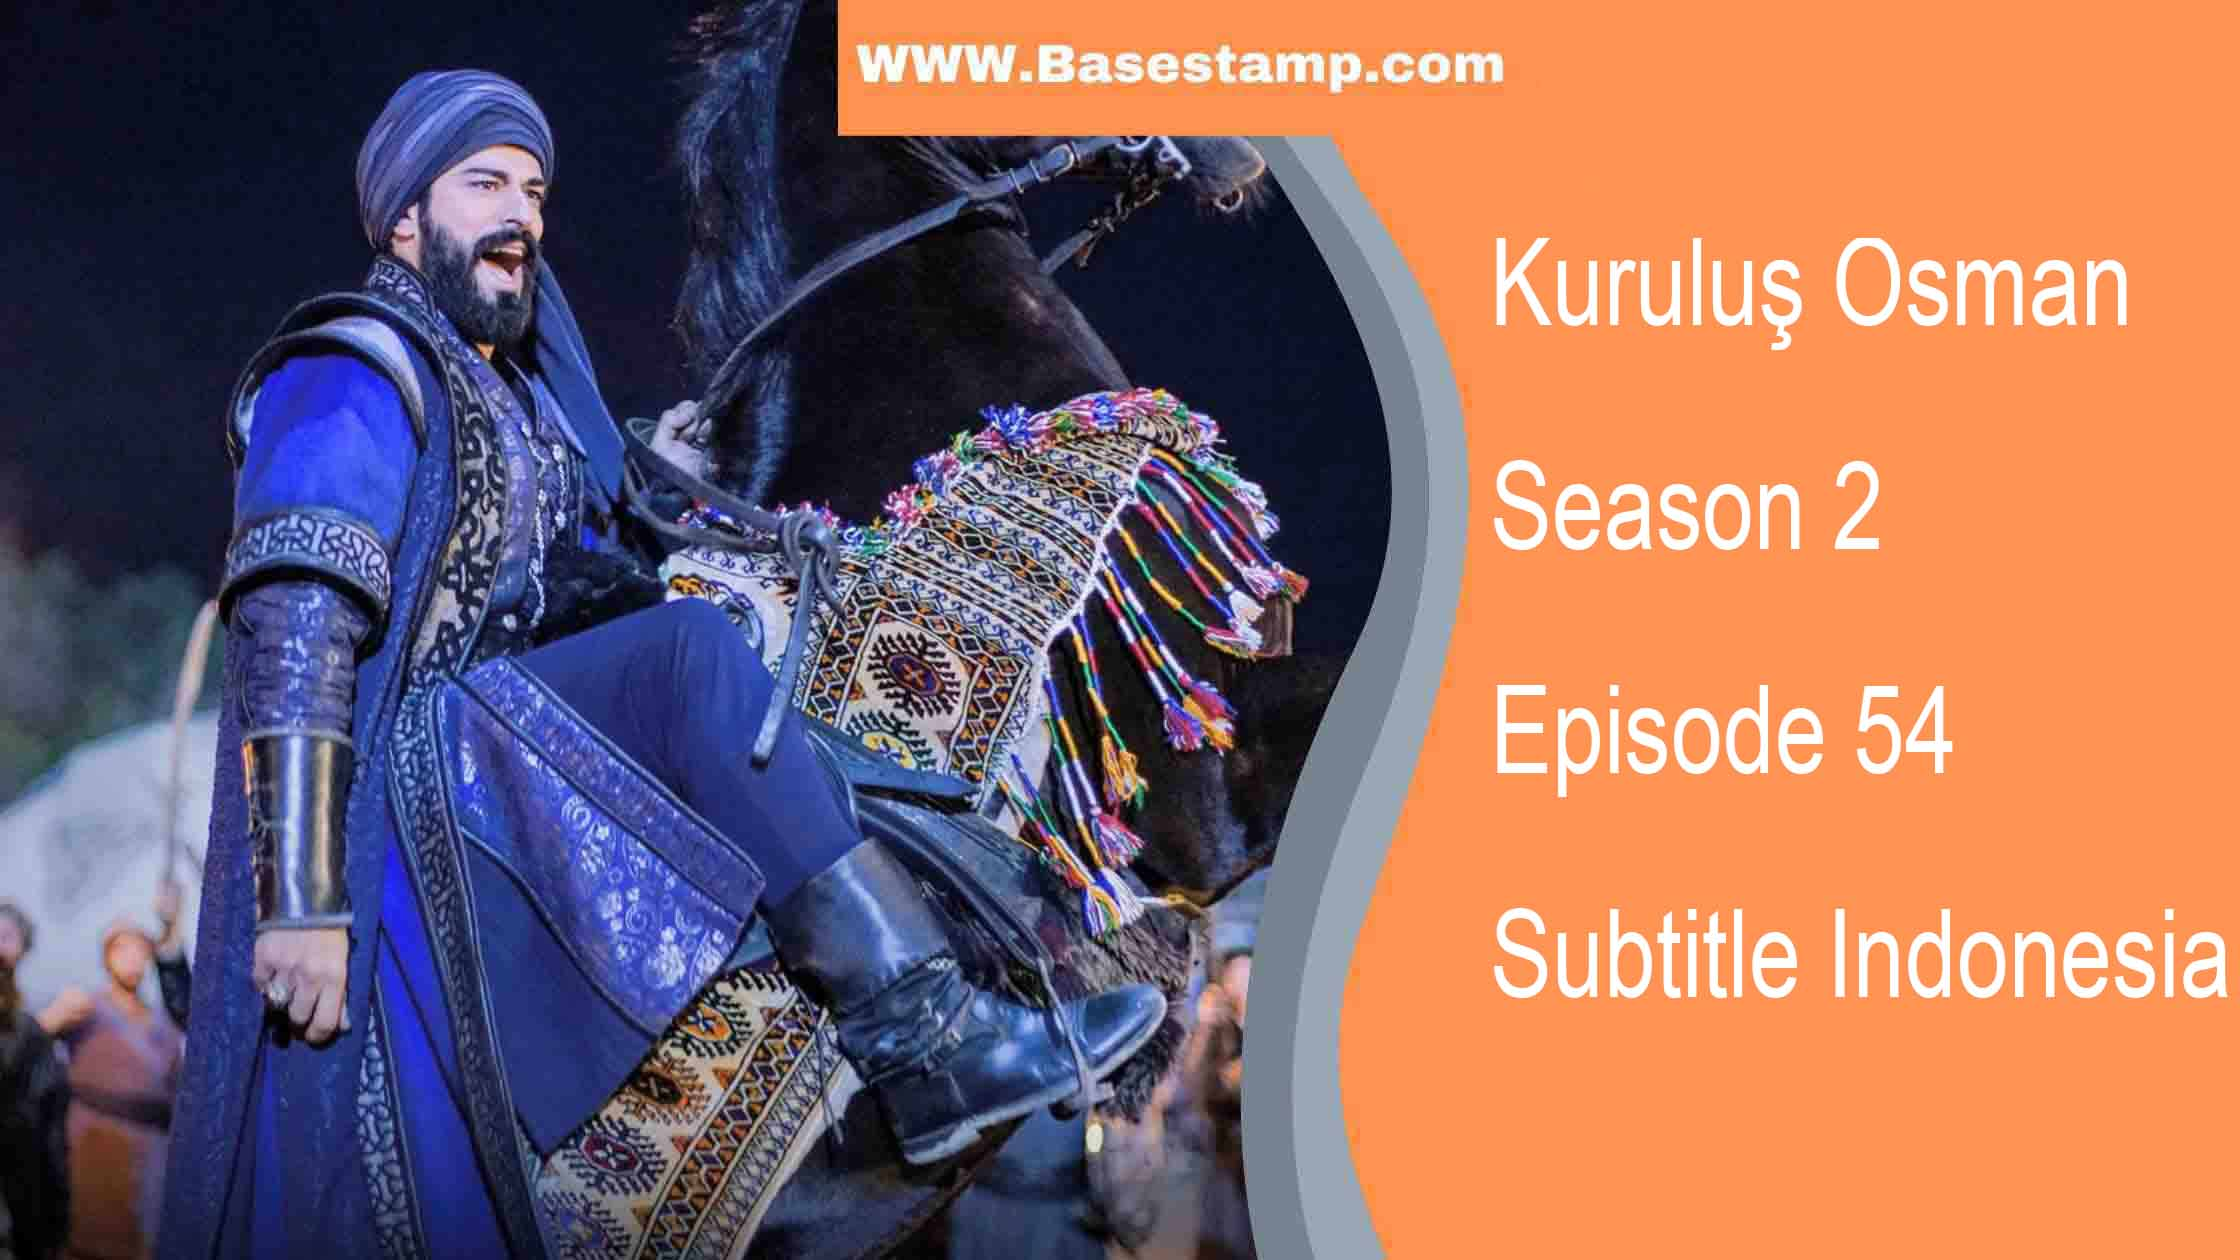 Kuruluş Osman Season 2 Episode 54 Subtitle Indonesia